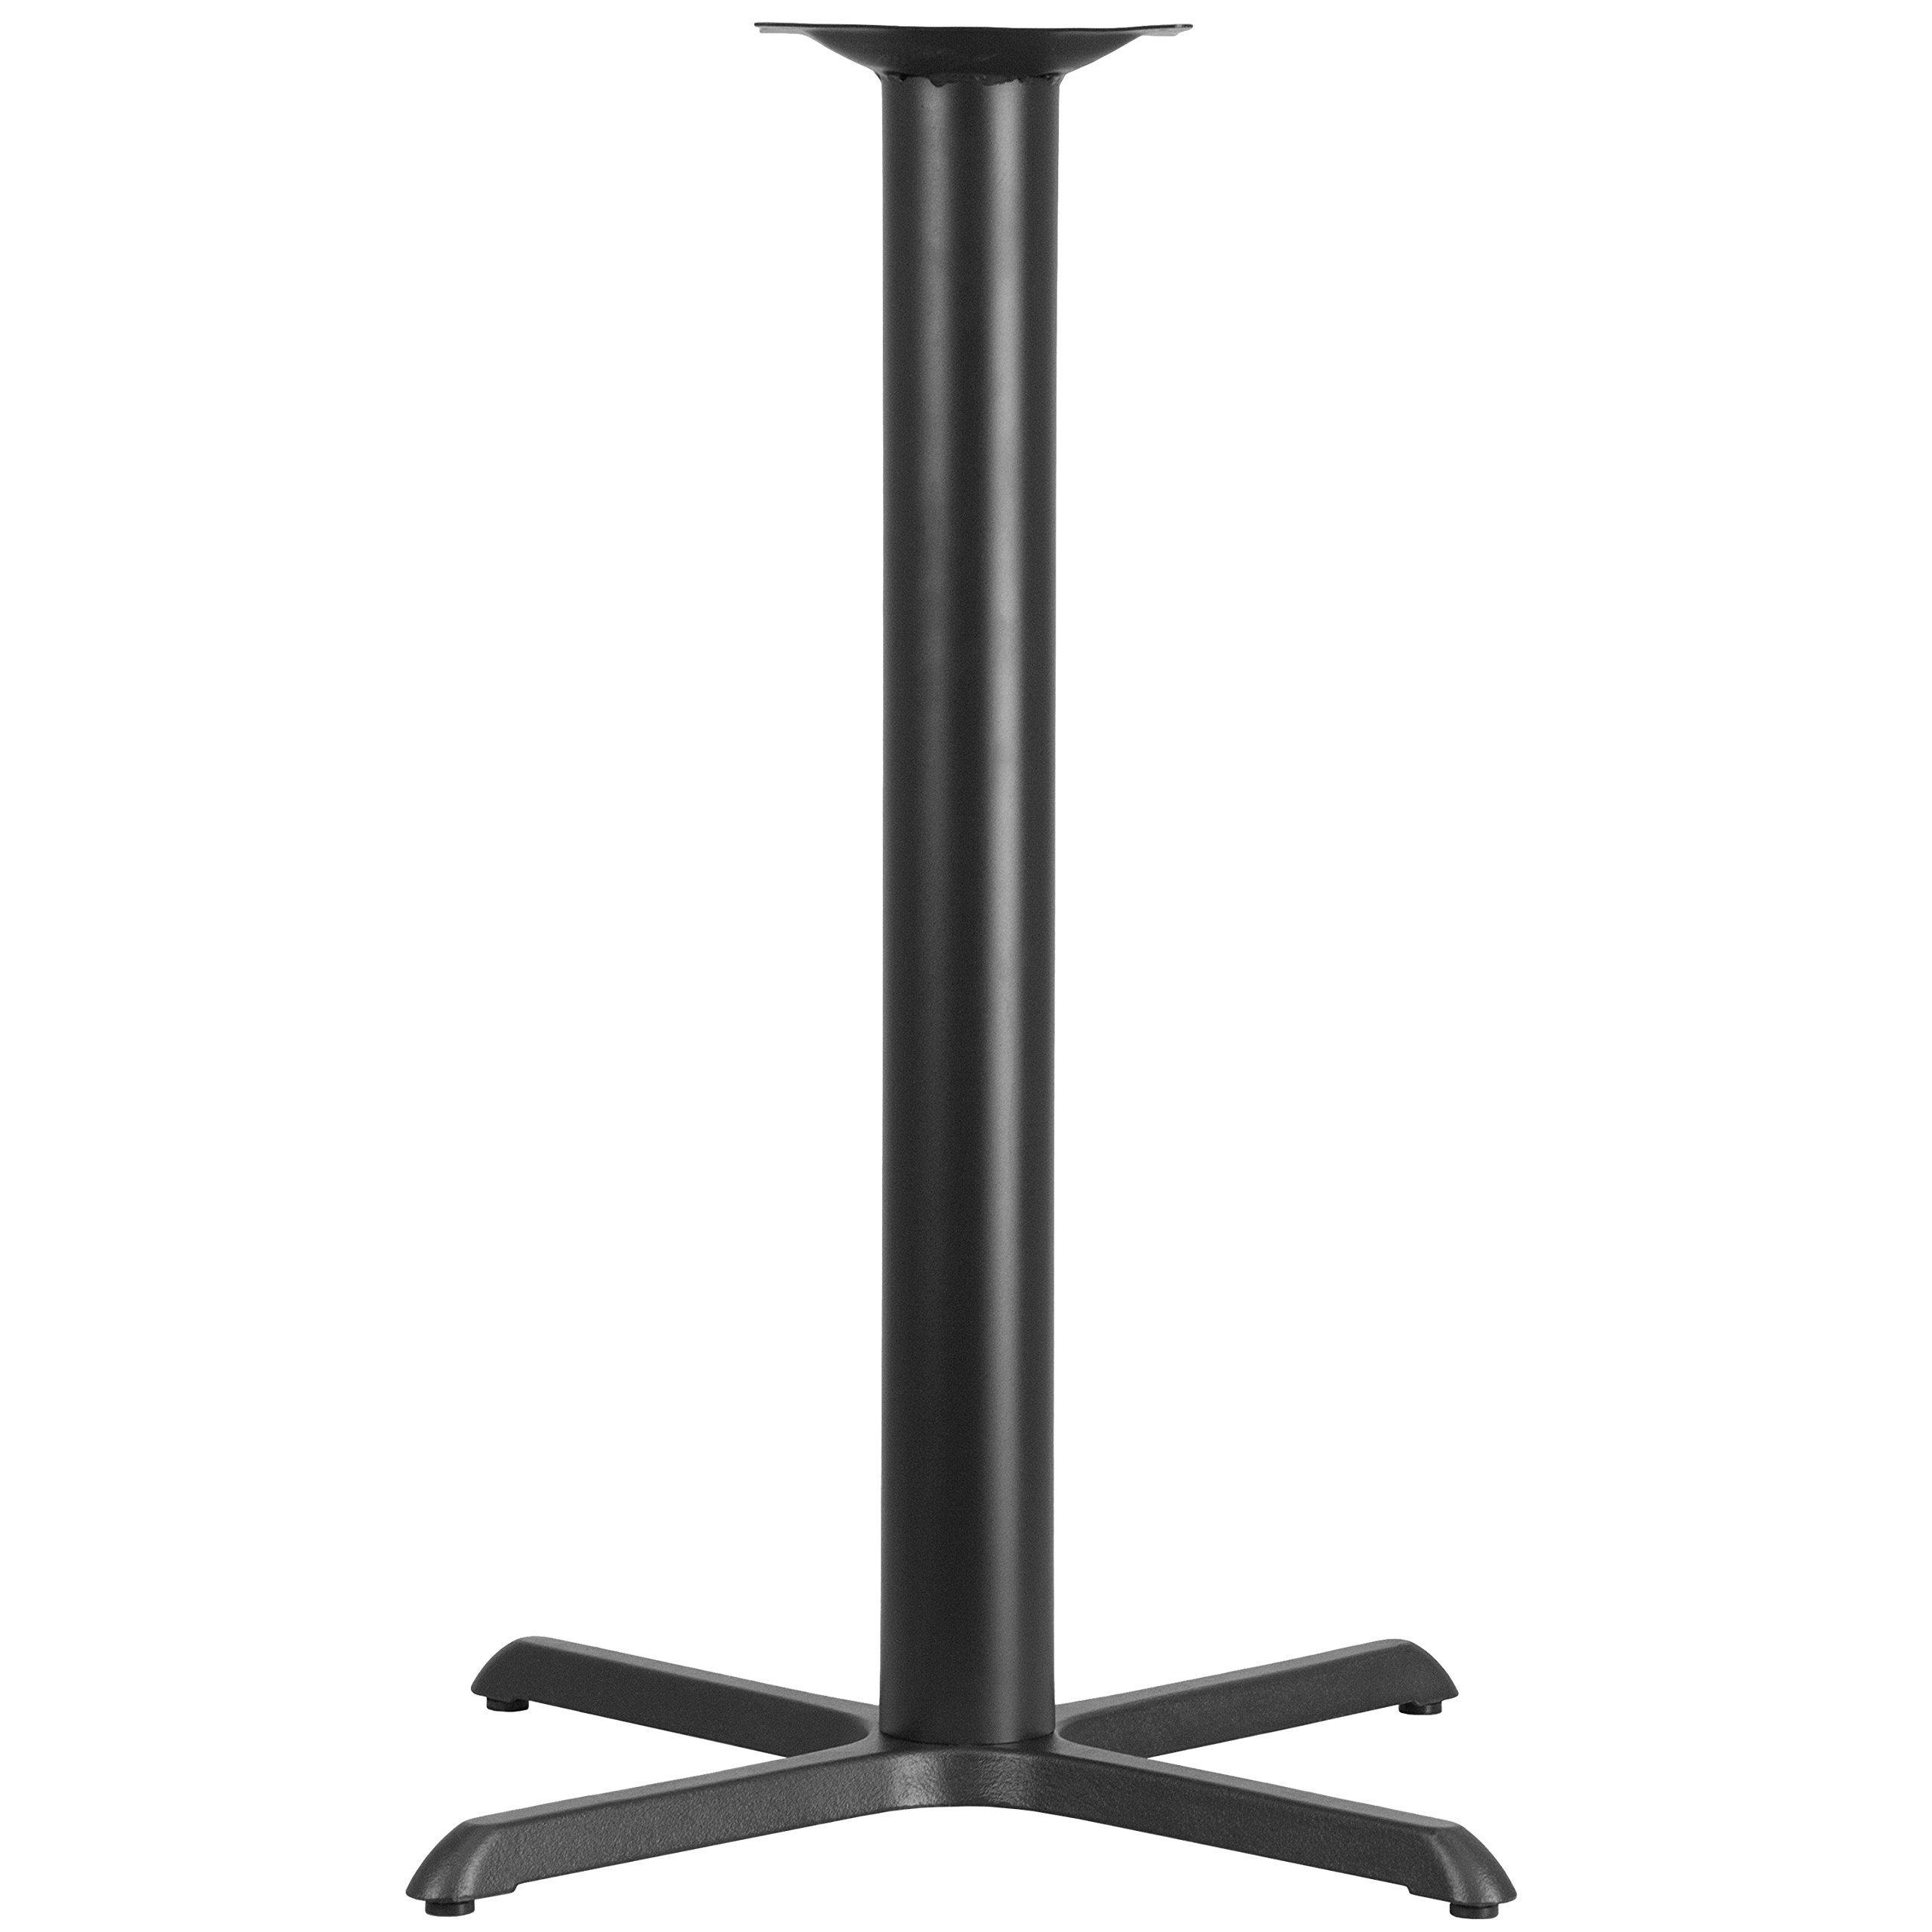 Flash Furniture 33'' x 33'' Restaurant Table X-Base with 4'' Dia. Bar Height Column